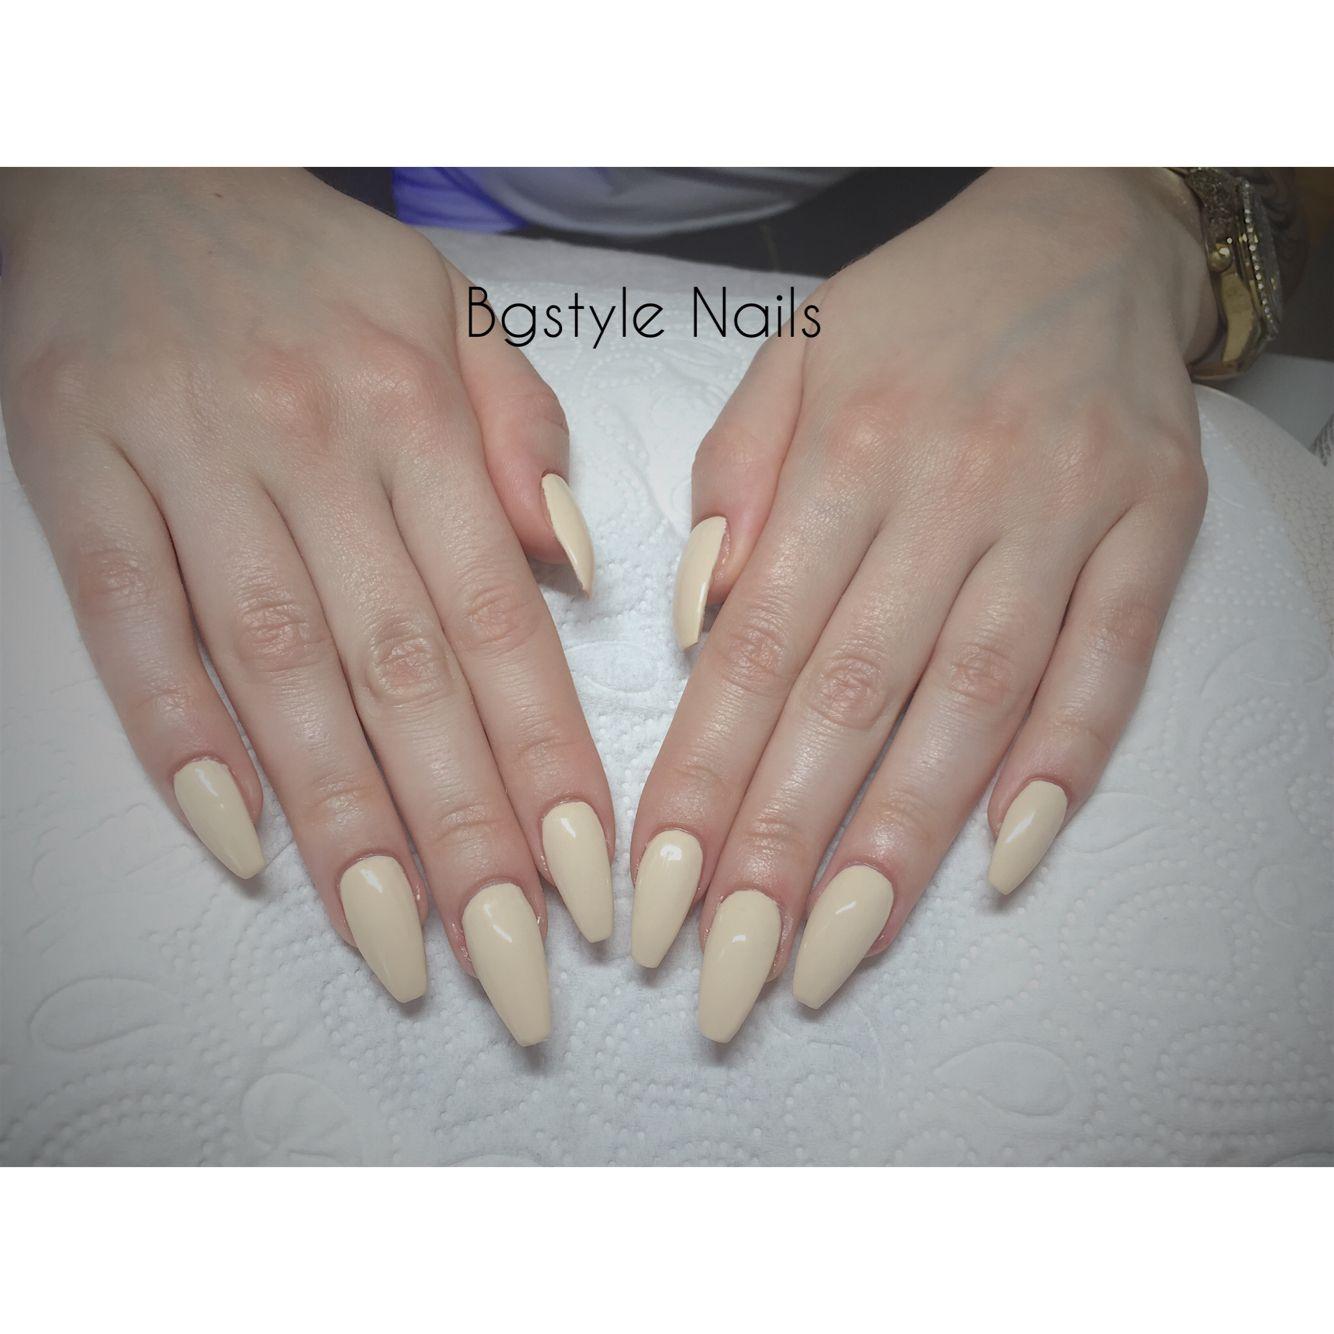 #GelNails #bgstyle_nails_n_jewelry #nails #sparklynails #naildesign #nailsbyme #naildesigns #gelnaegel #naegel #inistagood #ilovenails2016 #lovenails #swarovski #sculptednails #nailsfashion #nailsart #nailart #naillove #nailstyle #nailaddict #nailcouture #reednails  #nailstoinspire #instanails #BgstyleNails #zürich